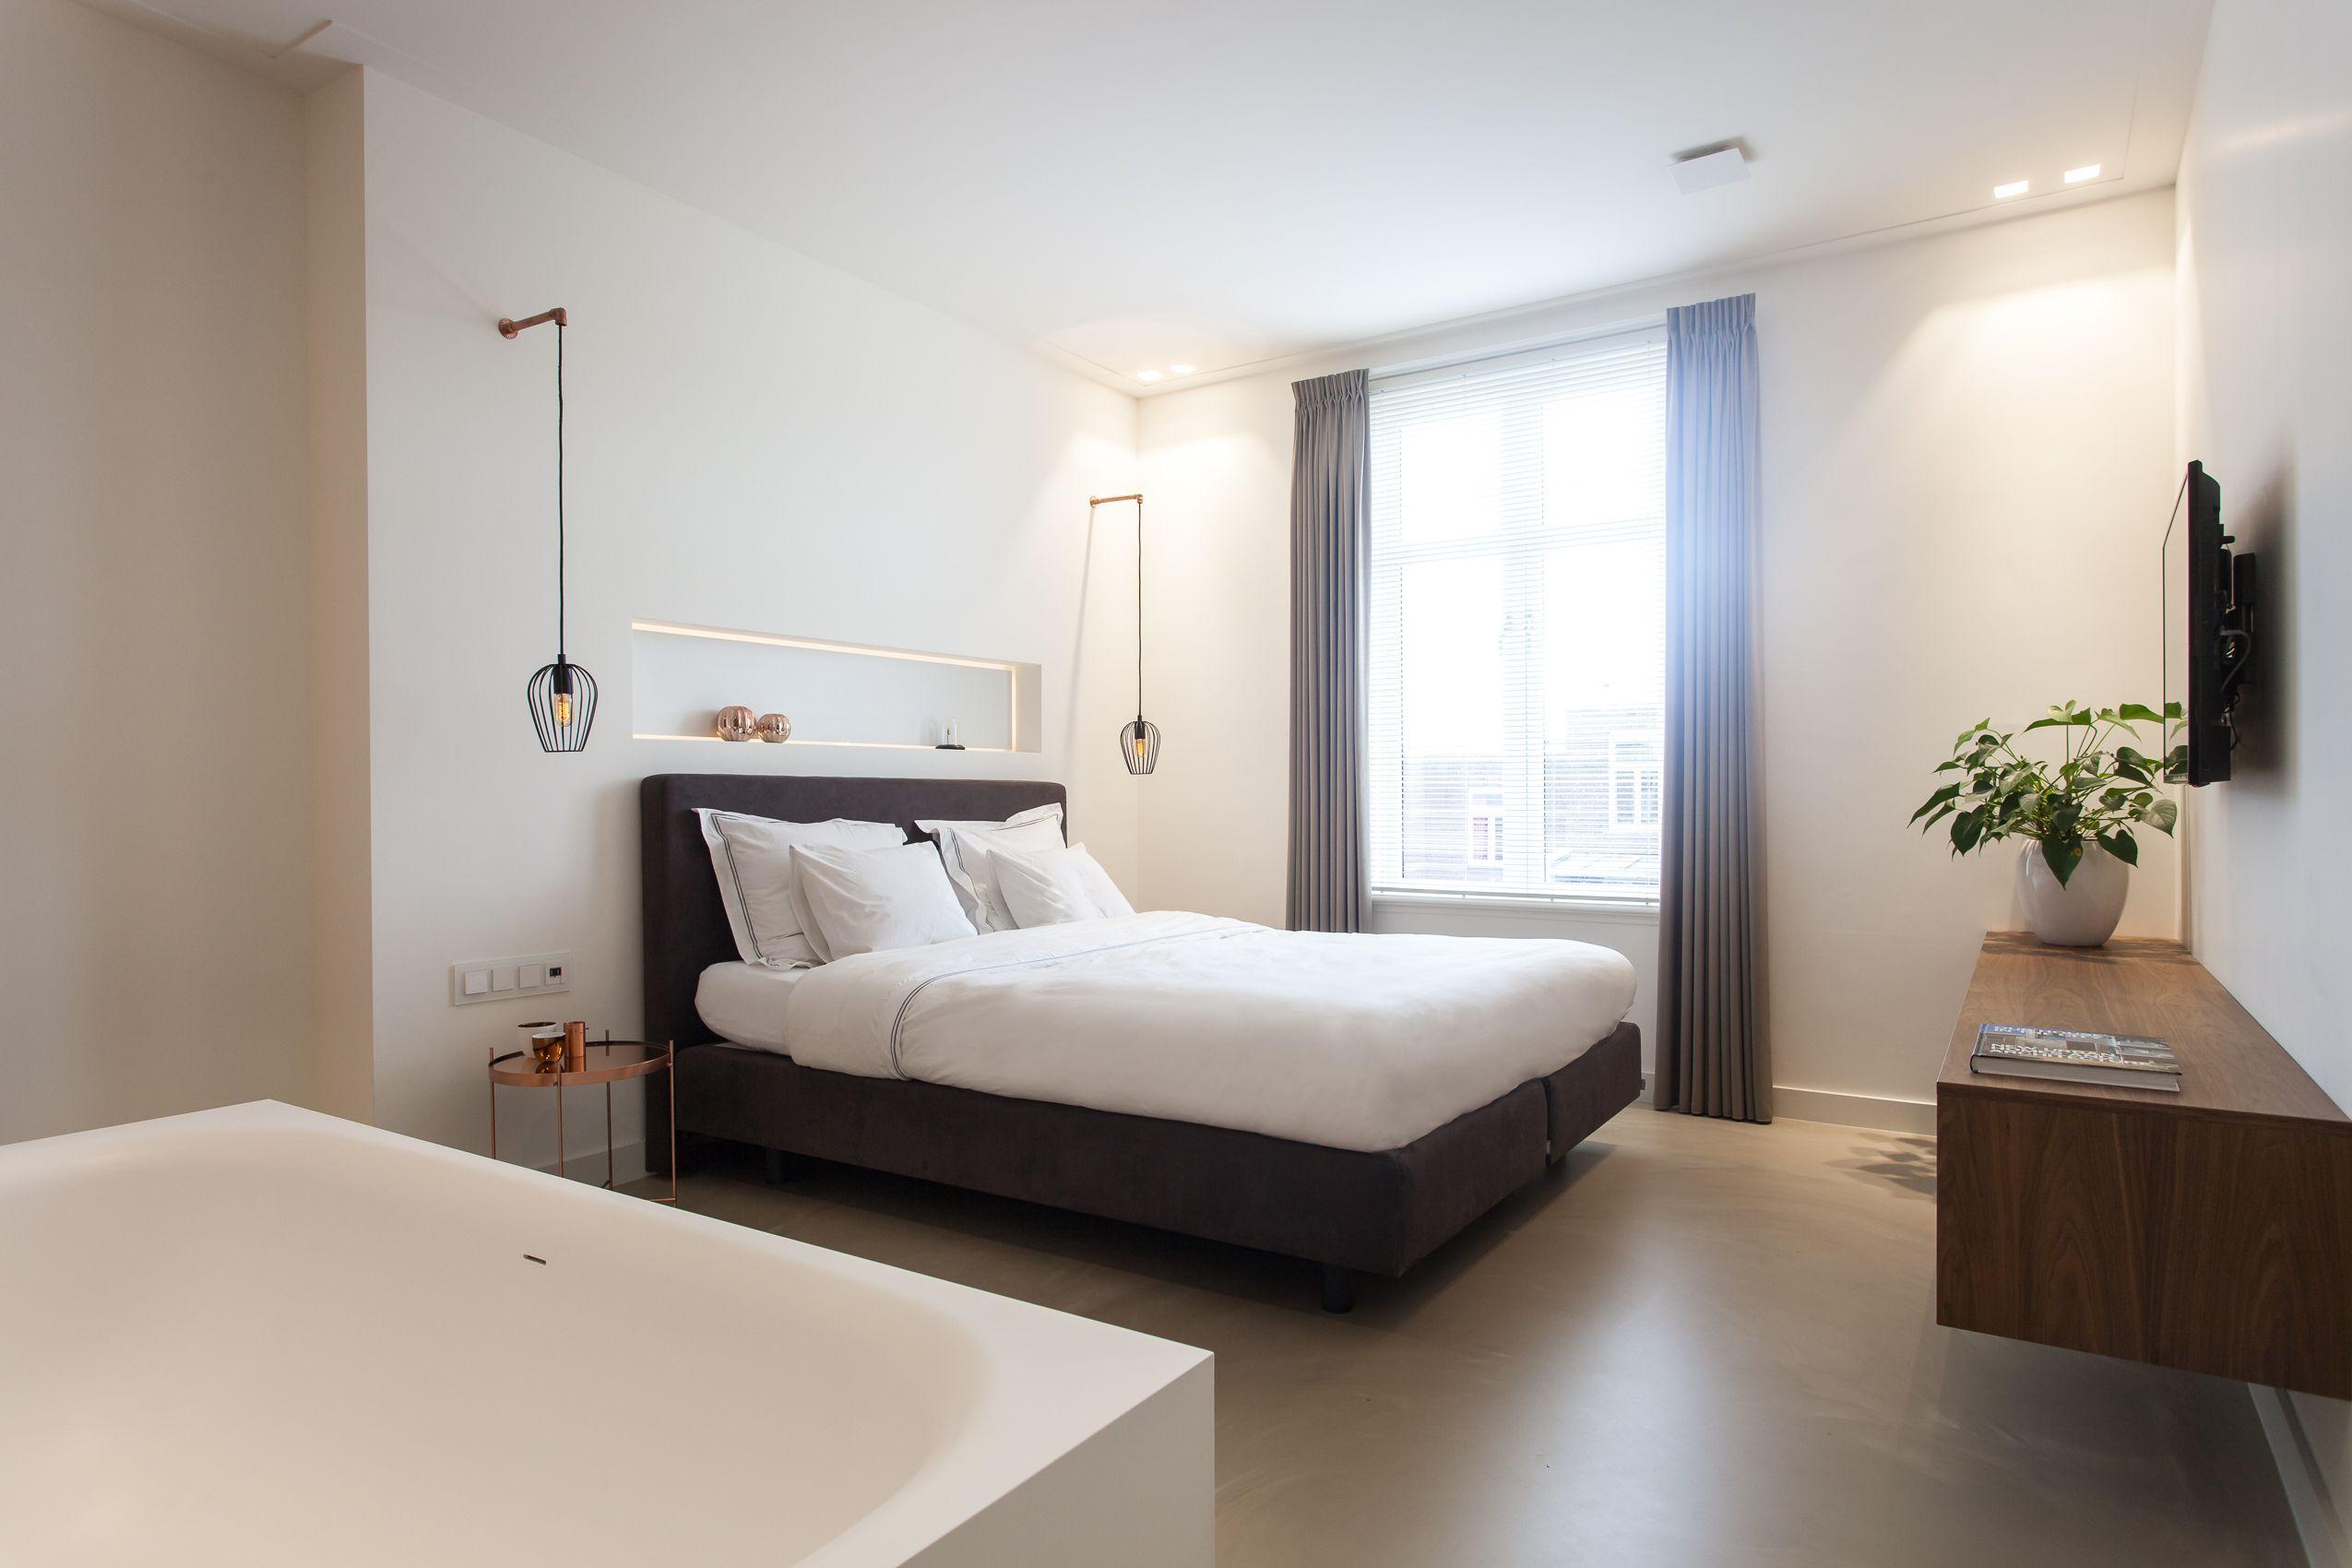 Ontwerp moderne slaapkamer met aanliggende badkamer in nijmegen